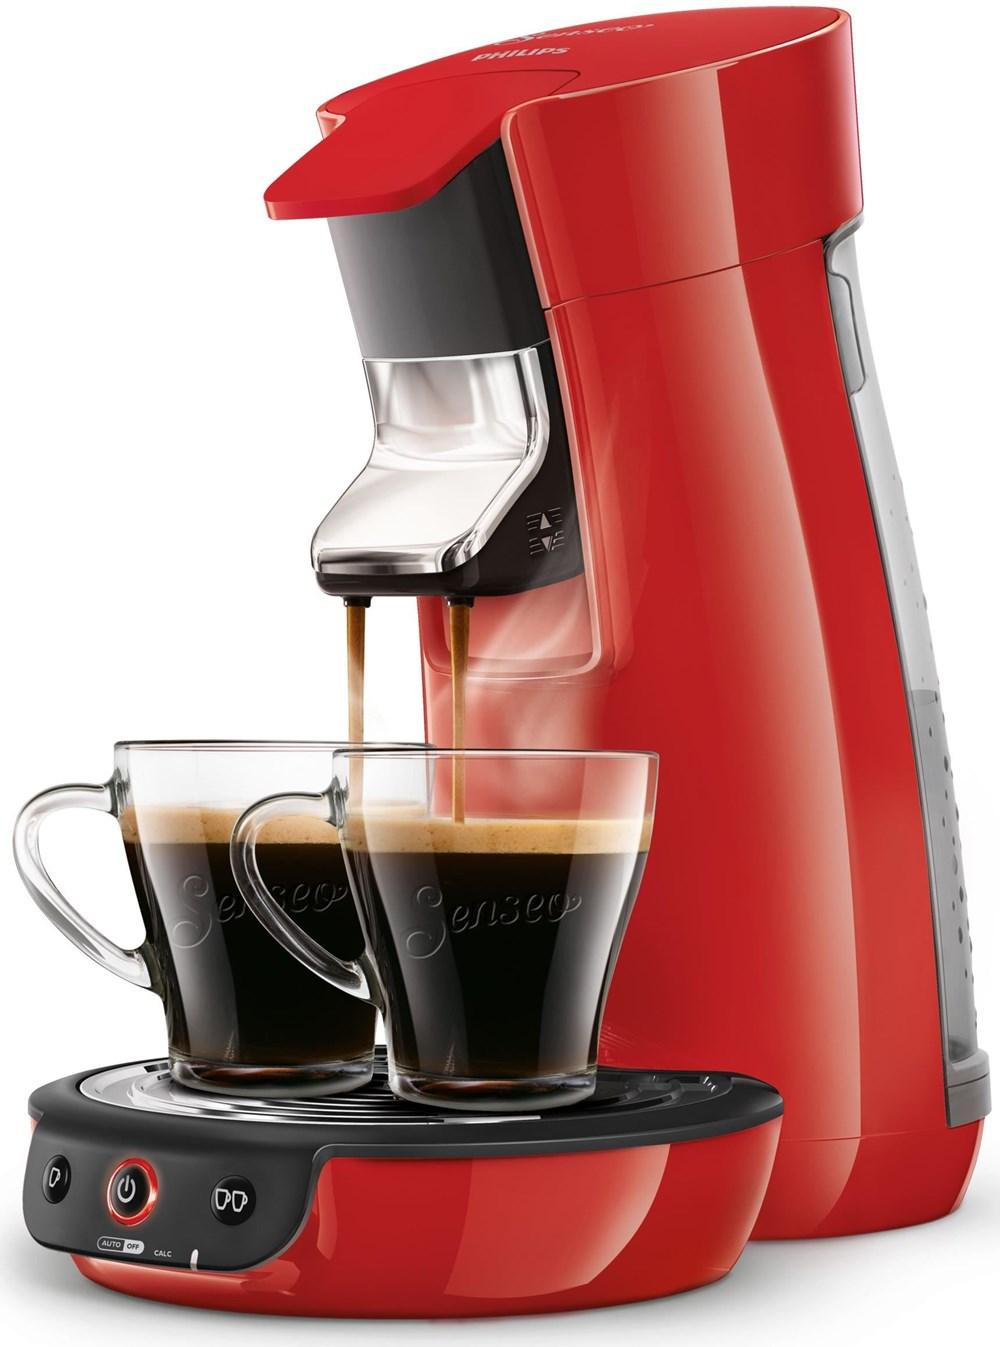 Philips HD7829/80 Senseo Viva Café rot (B-Ware)